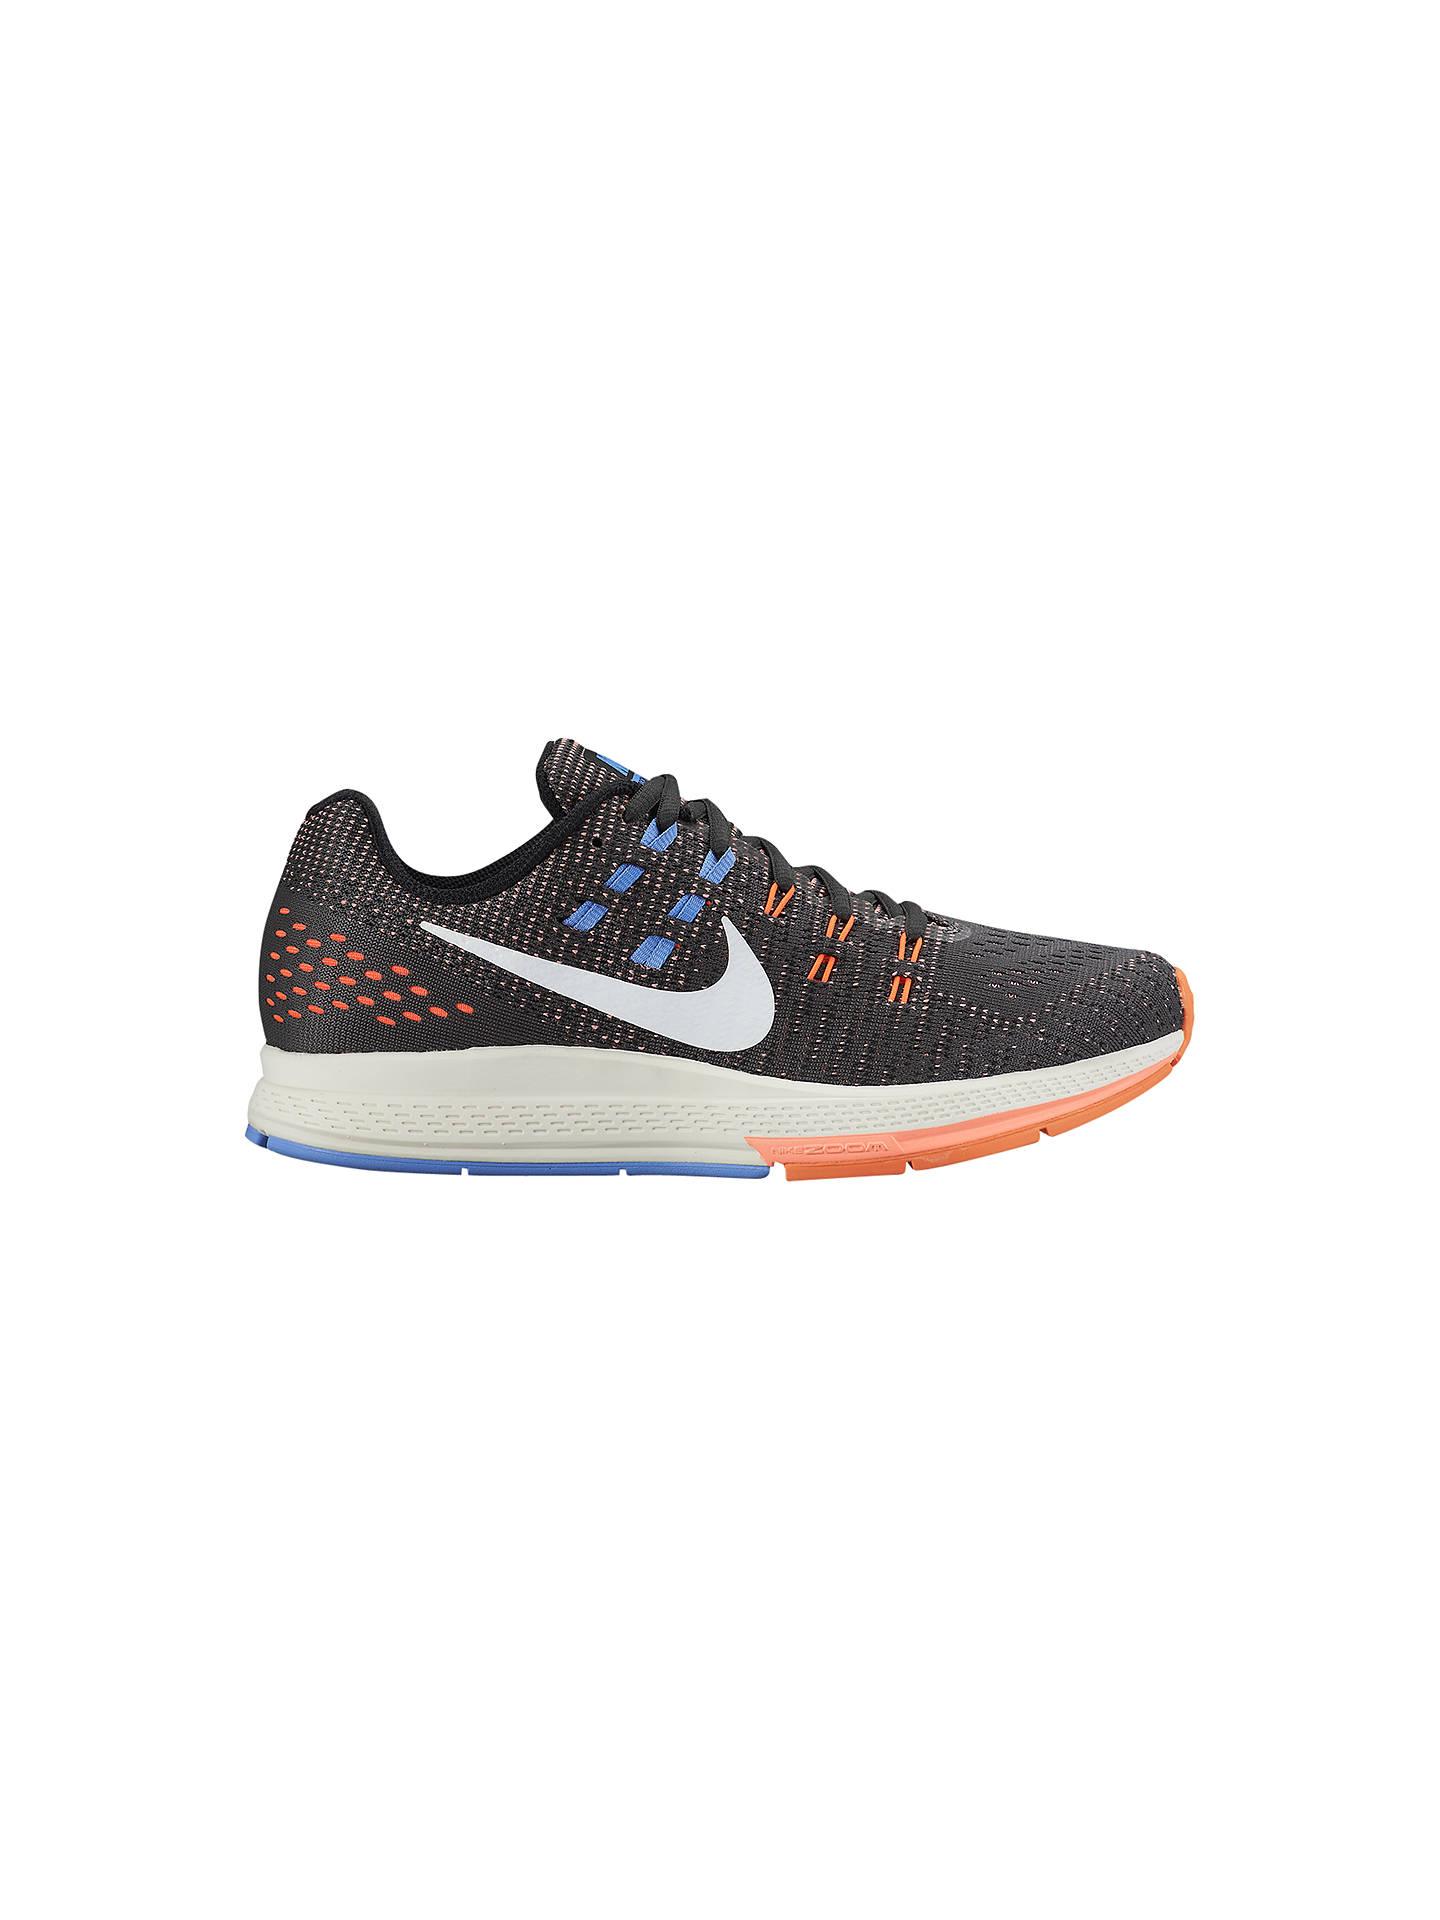 huge discount 03709 6c859 Buy Nike Air Zoom Structure 19 Women s Running Shoes, Black Orange Blue, ...